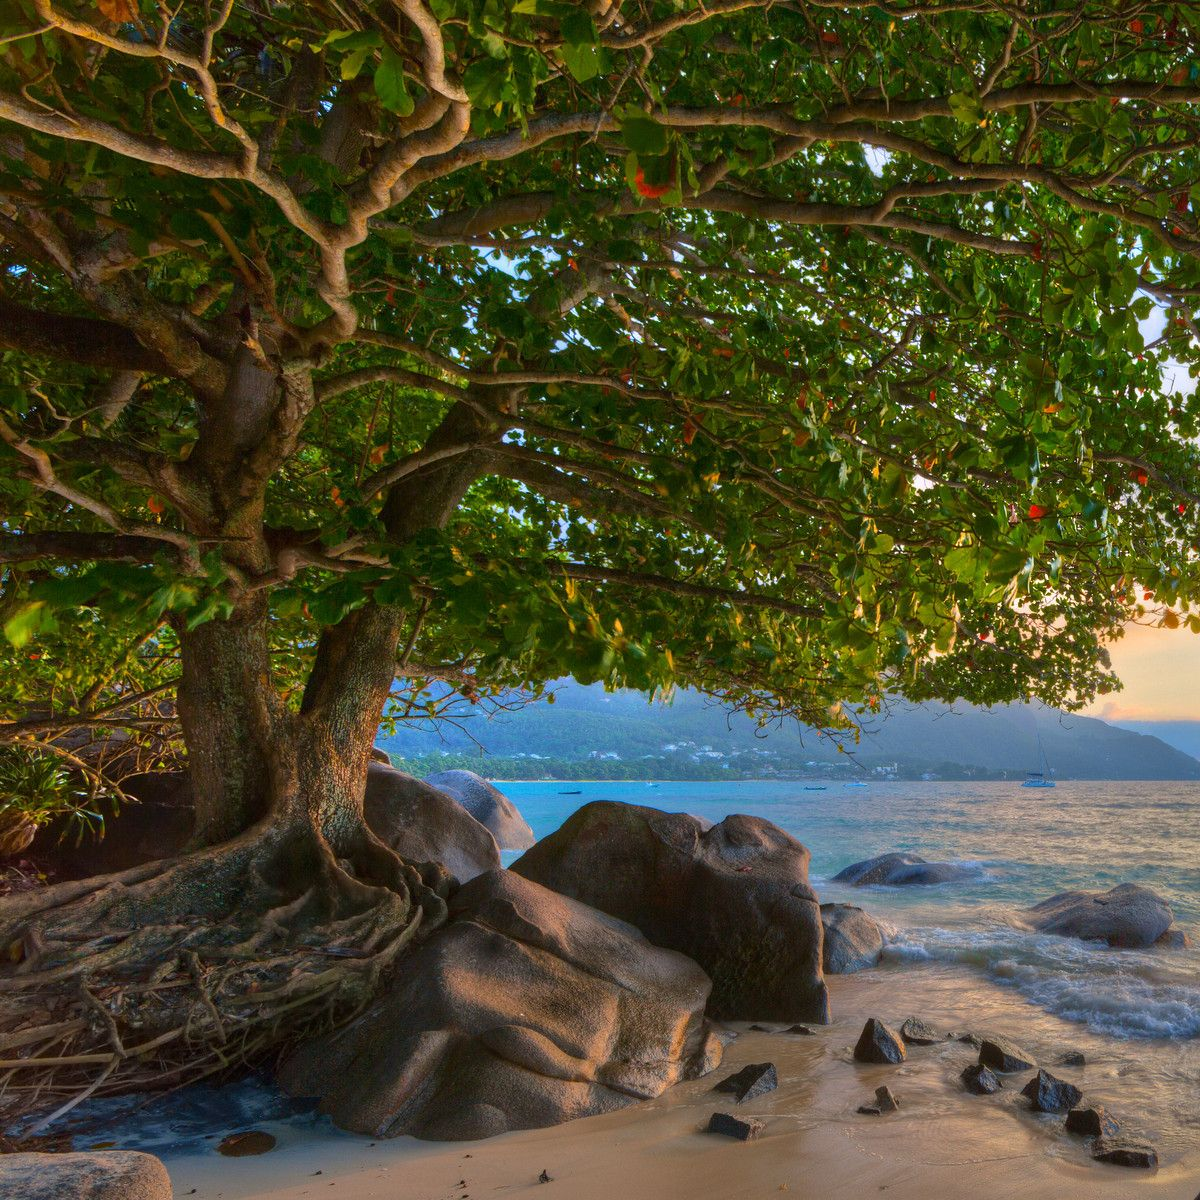 Seychelles Island Beaches: Seychelles Beaches By Mark Smith